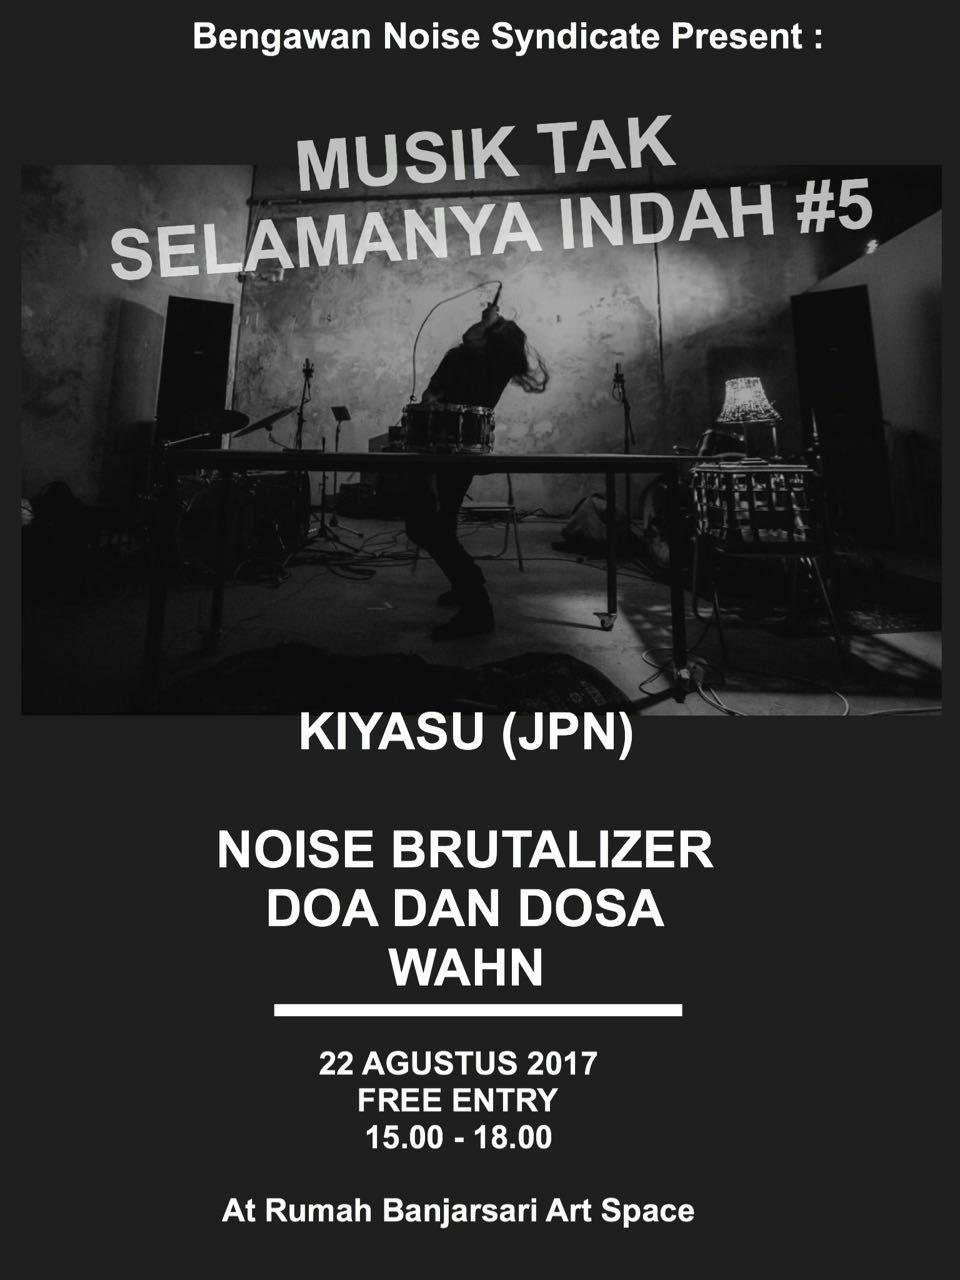 Ryosuke Kiyasu Bali Photo Tour 17 19 Agustus 2018 August Tanjong Pinang United Beach Camp Fest 2017 20 Tuck Trap 21 Bahana Studio